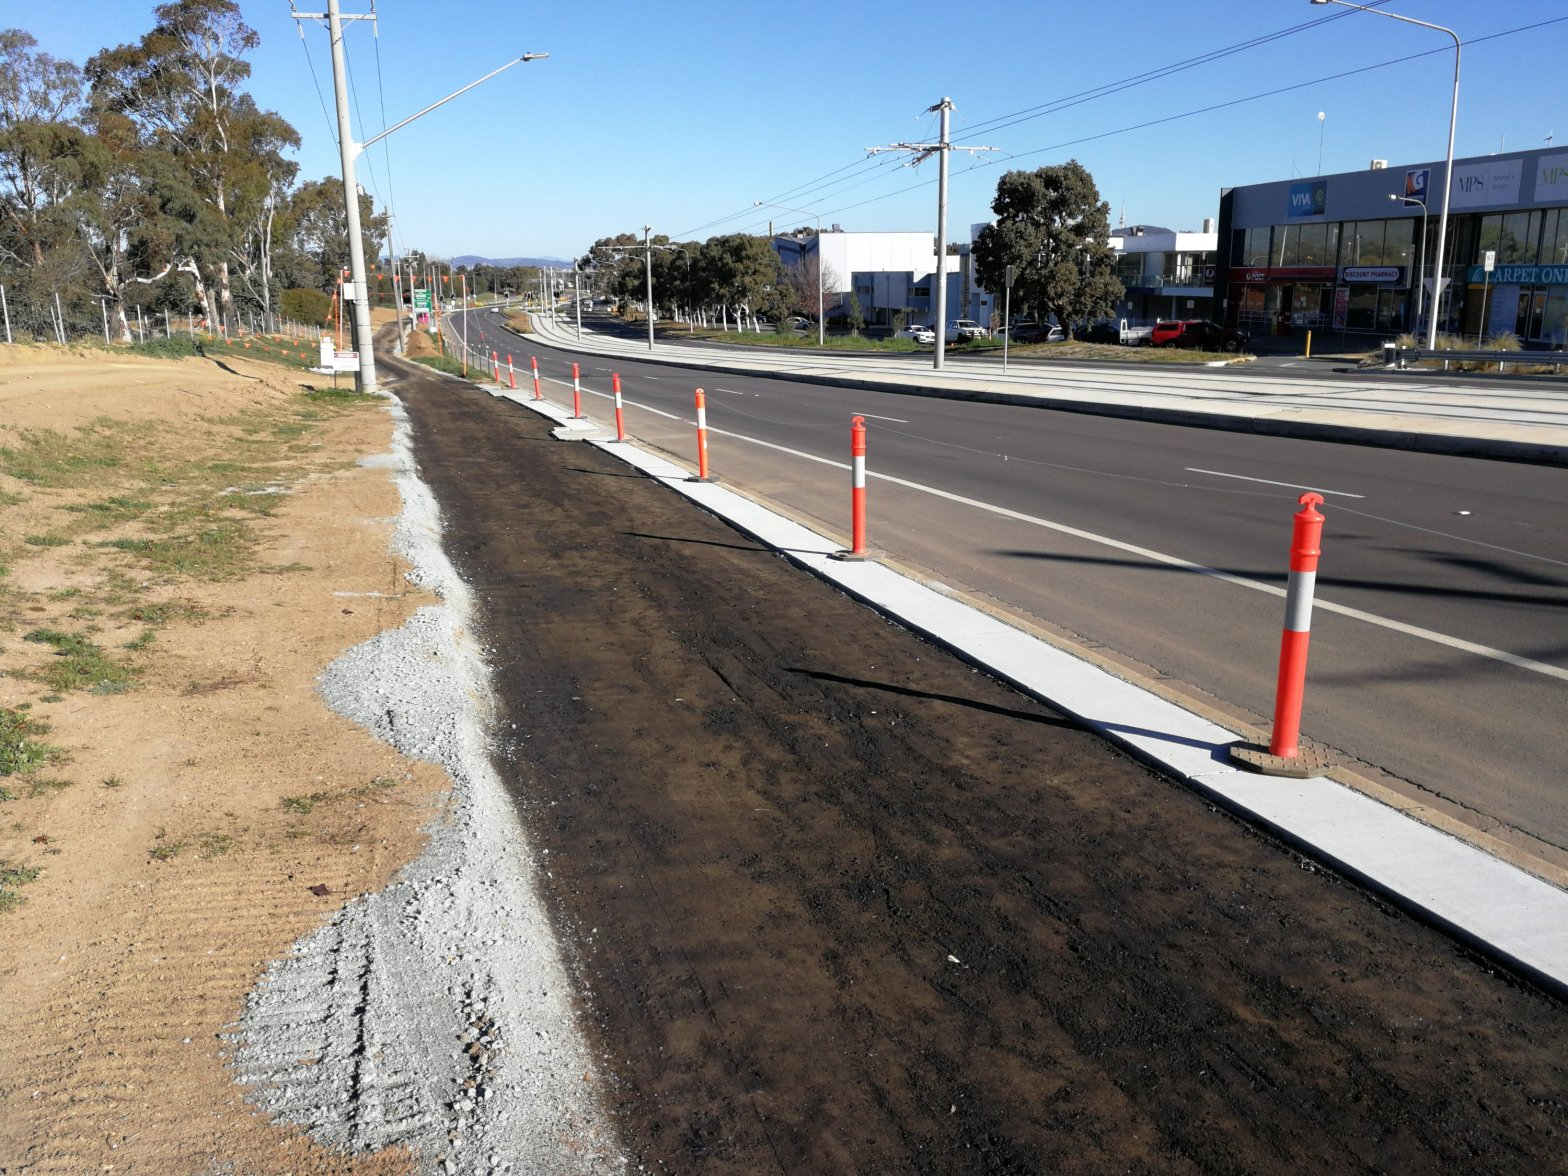 CBR Cycle Route C11 City - Gungahlin via Dickson, Main Community Route, Flemington Road bike path, Mitchell, Canberra.